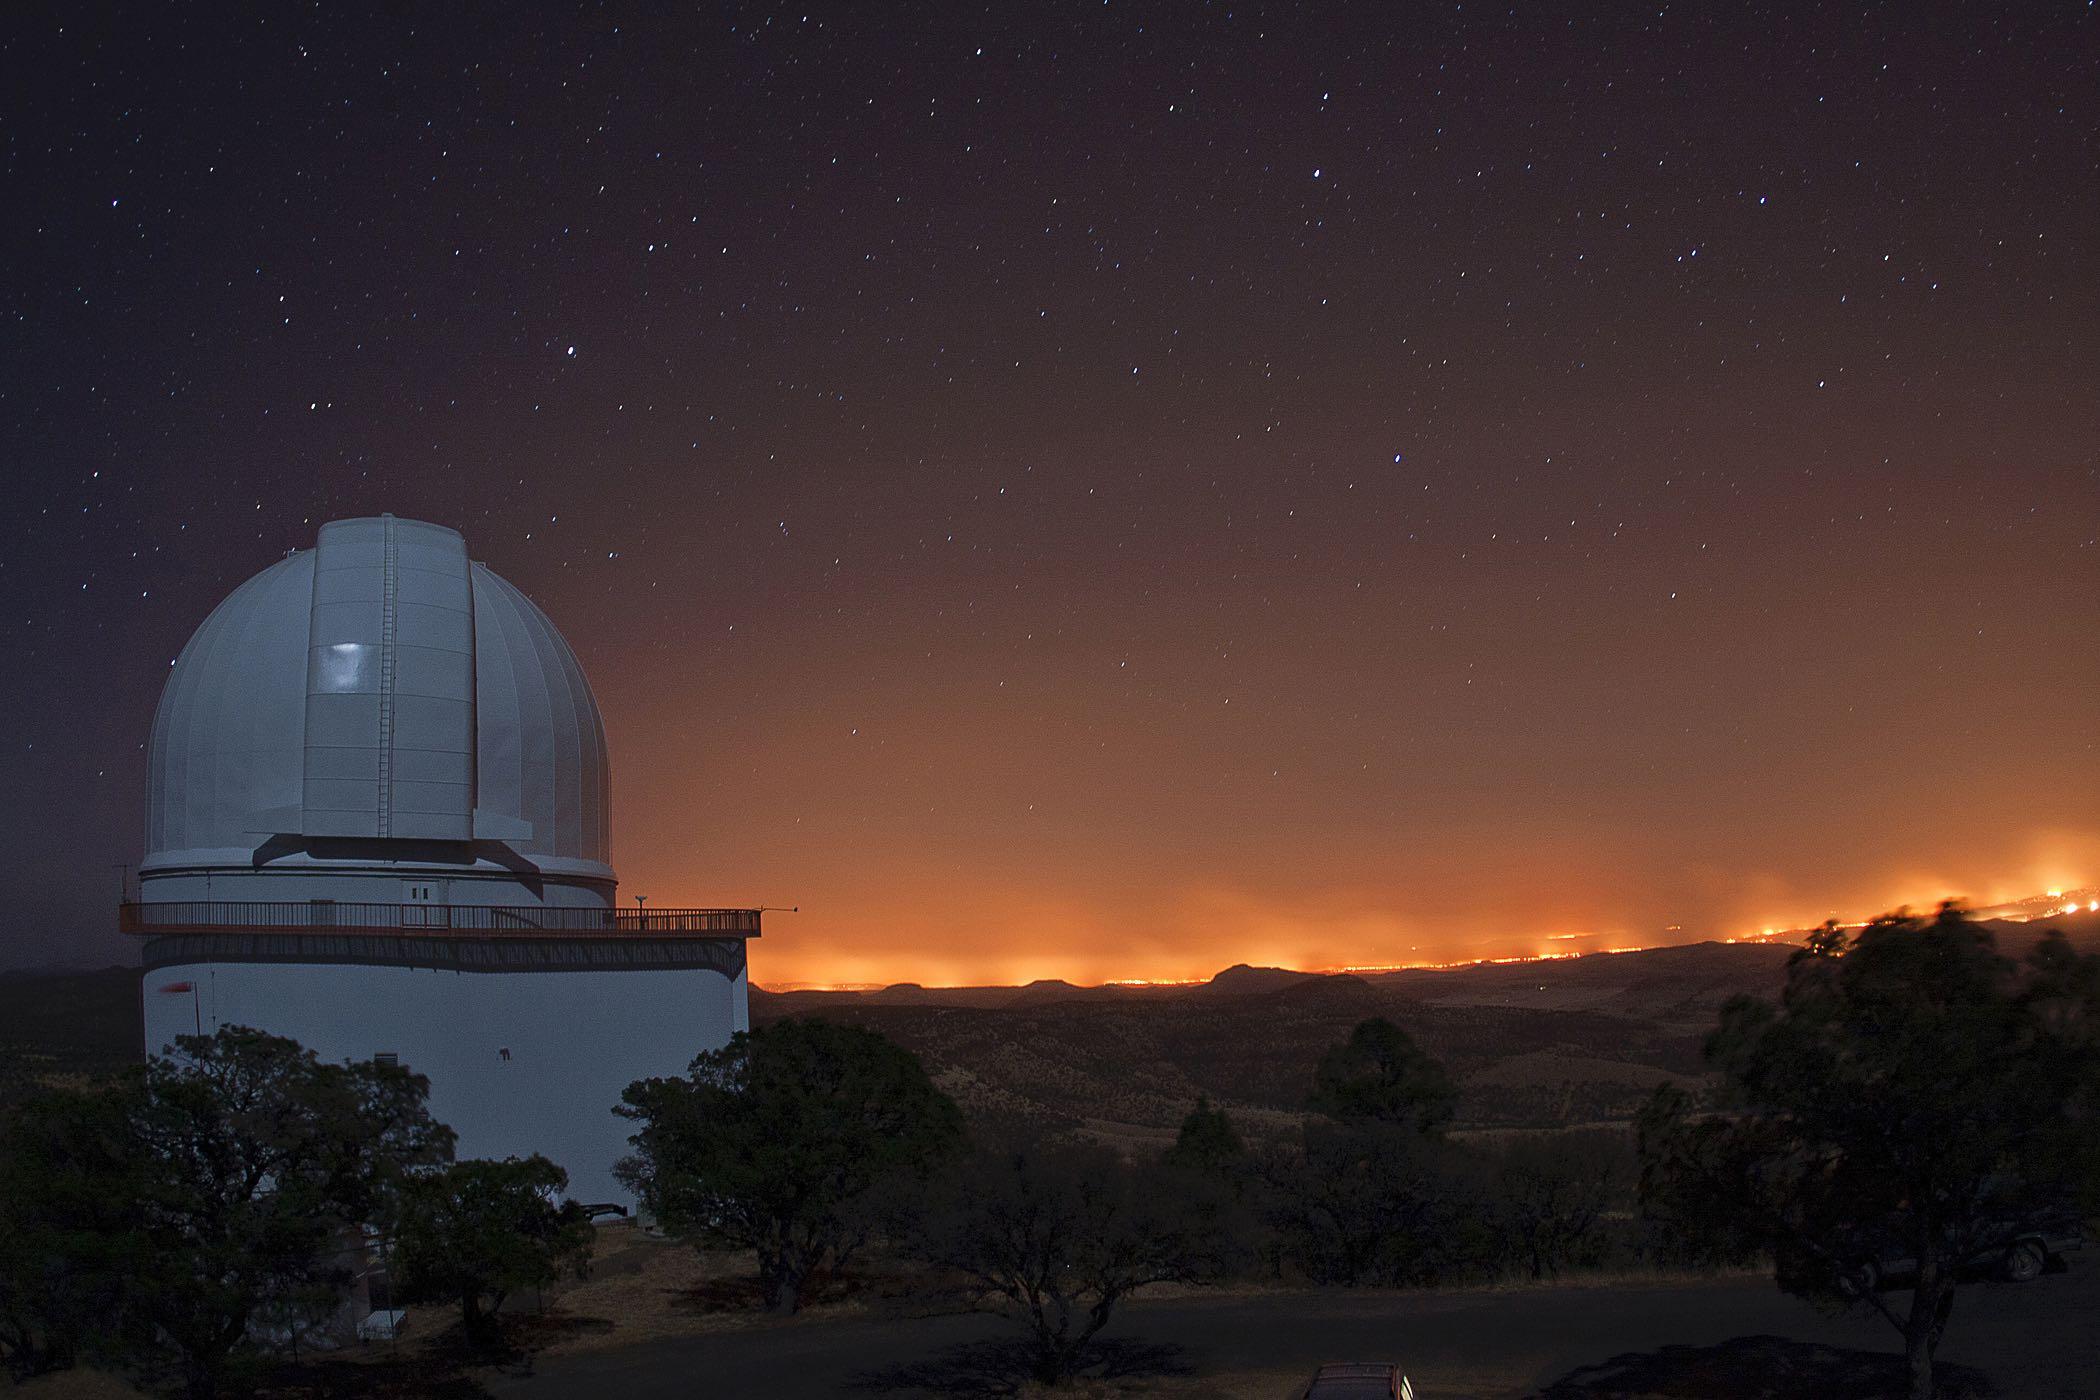 Caption: Smith Telescope McDonald Observatory, Credit: McDonald Observatory